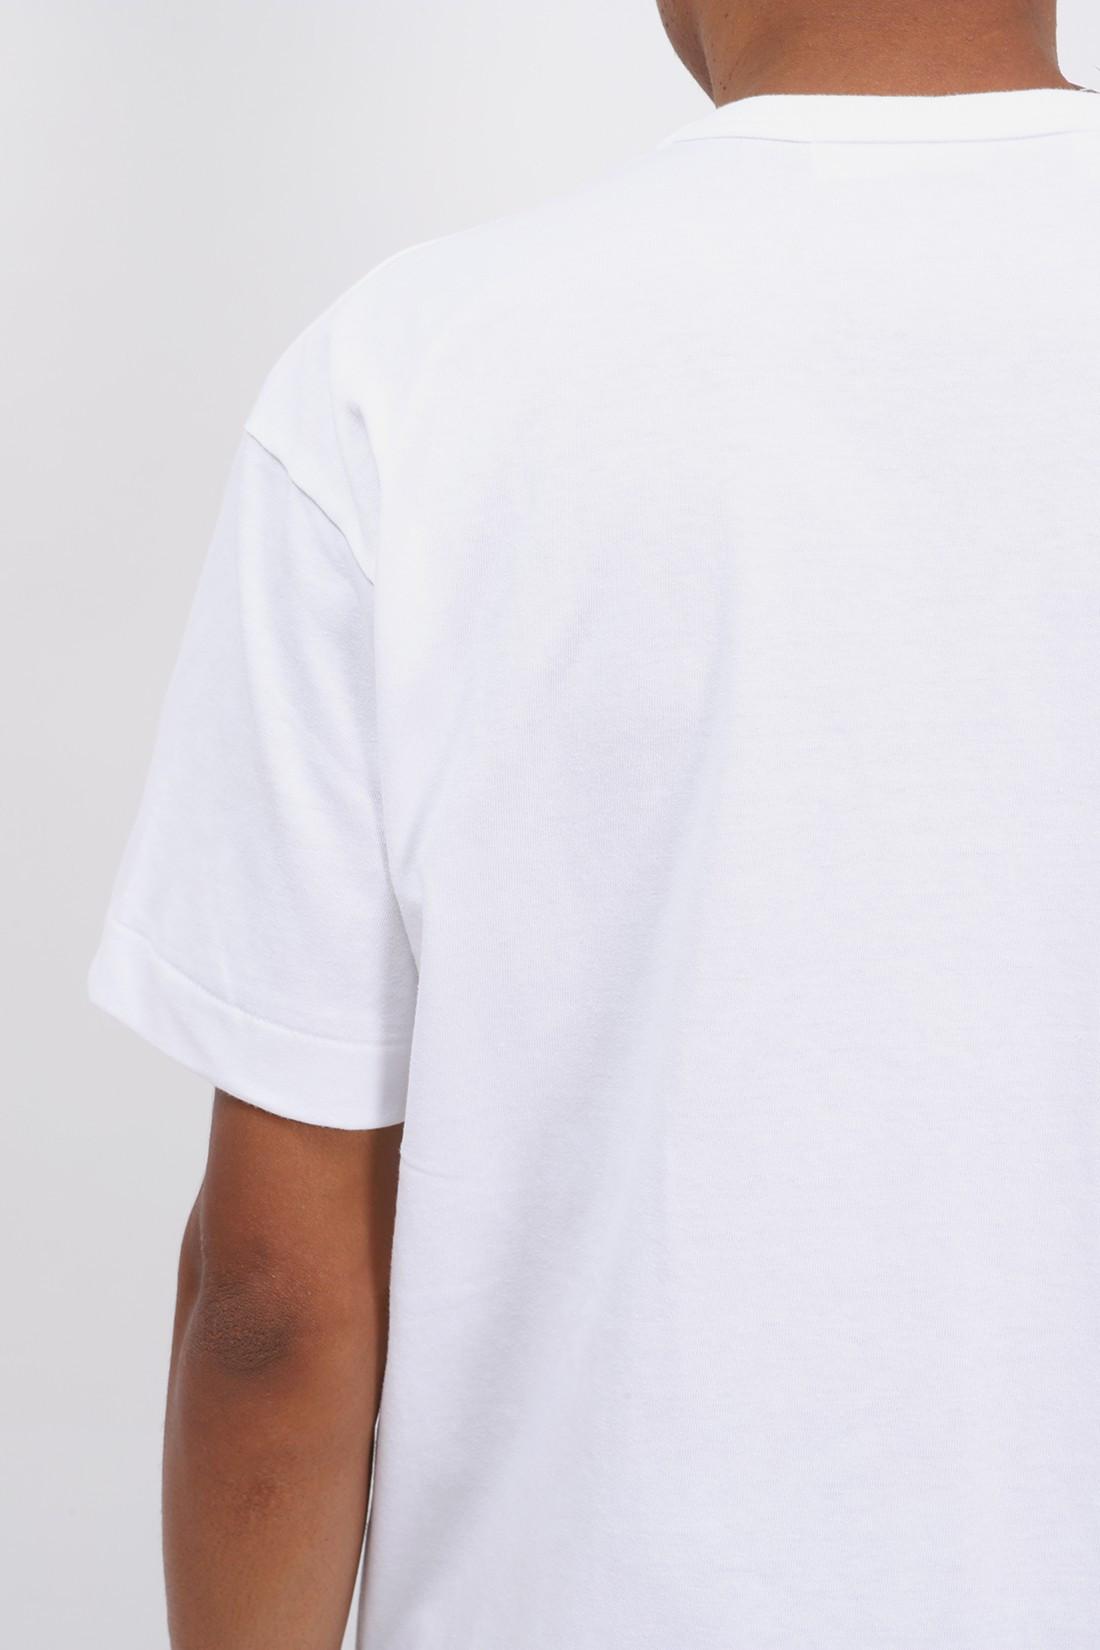 COMME DES GARÇONS PLAY / Red play t-shirt White